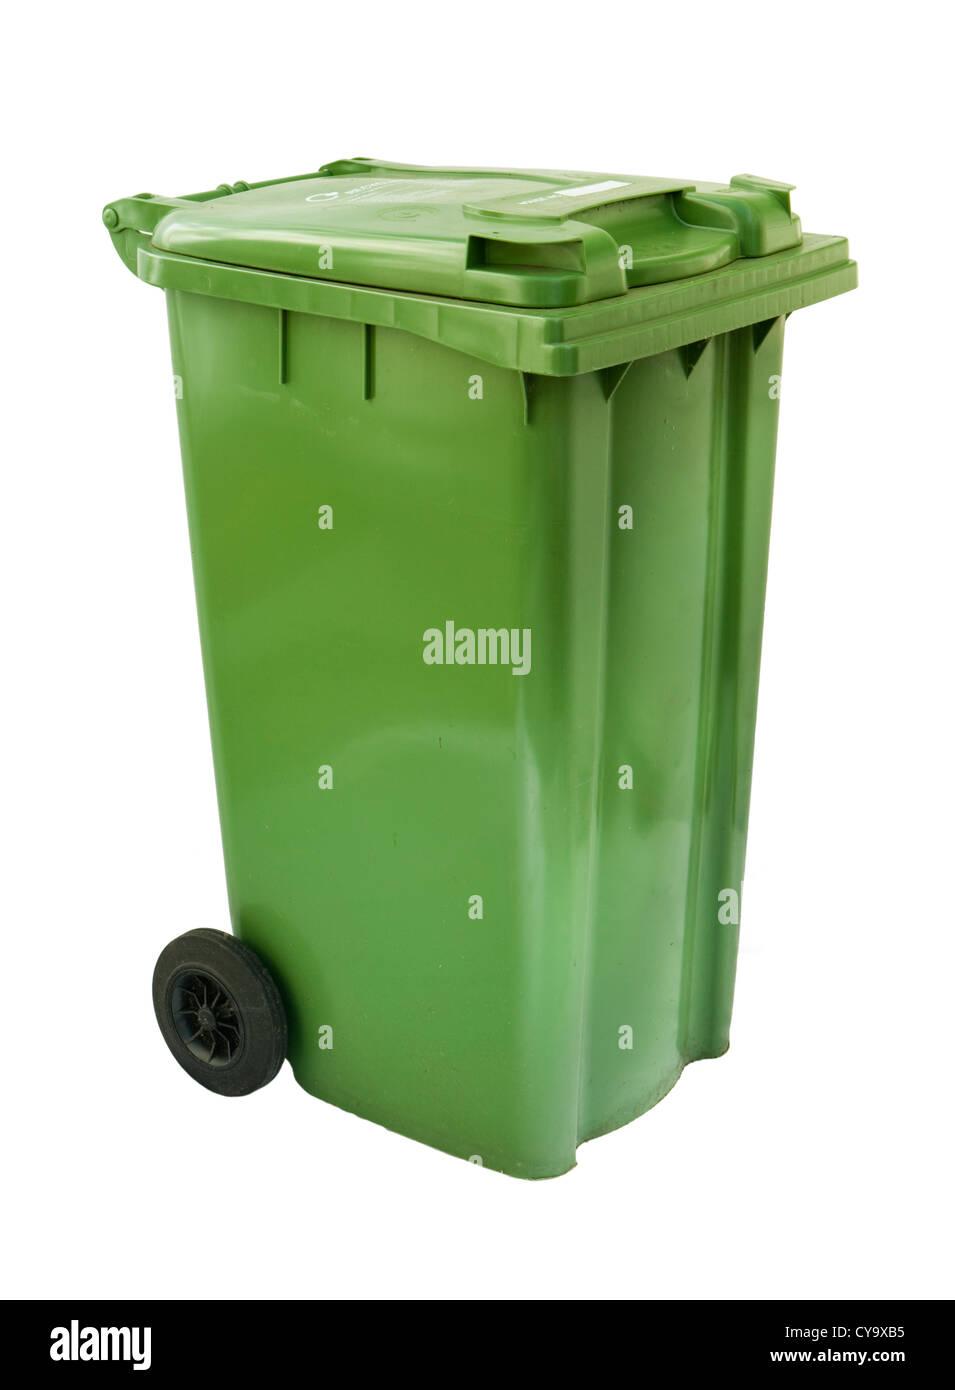 Green wheelie bin. - Stock Image